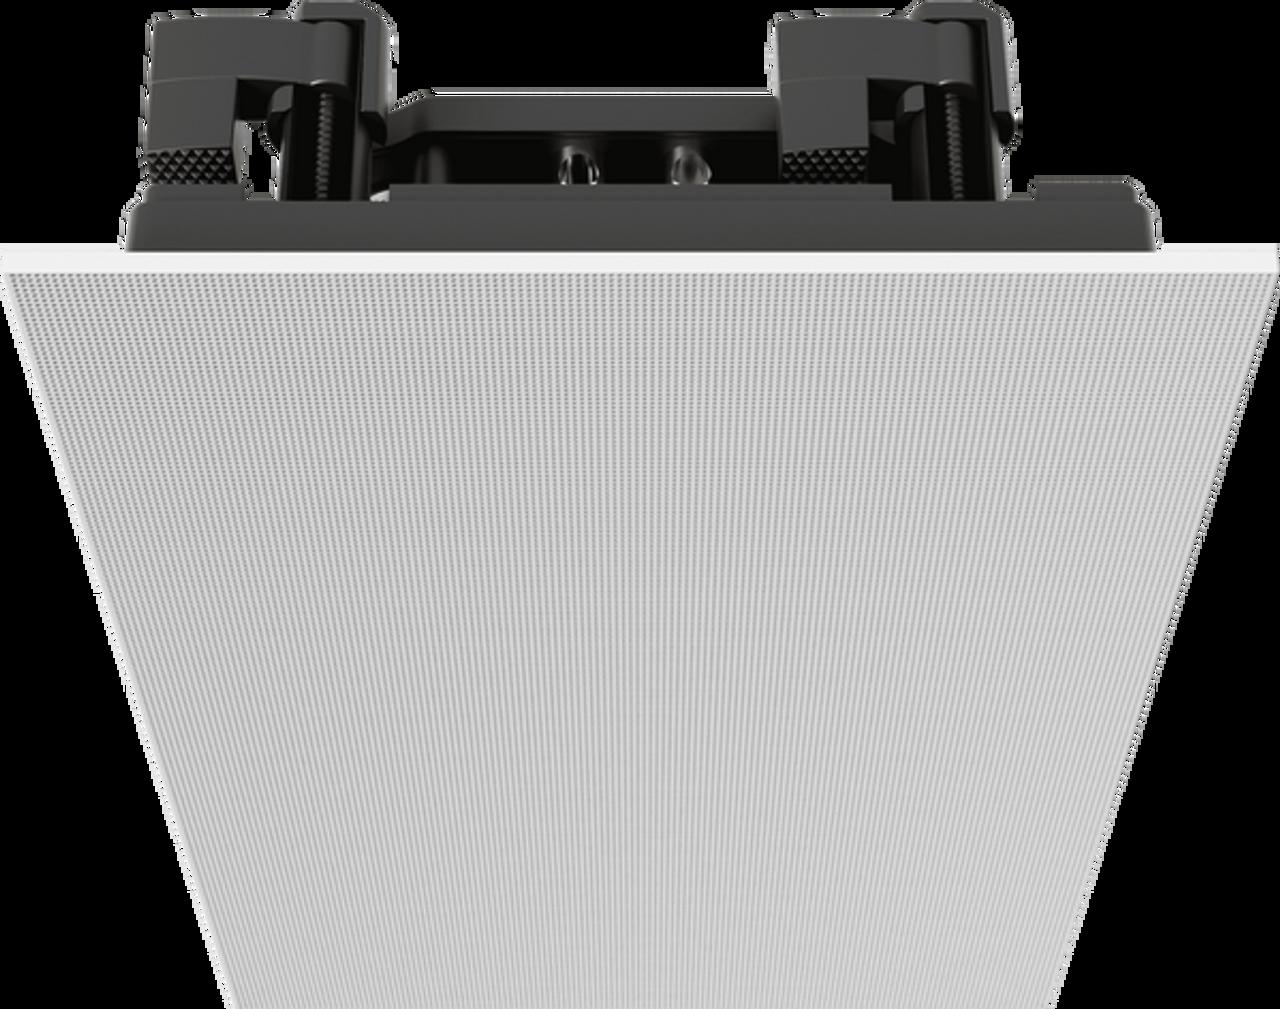 Sonos In-Wall Speaker by Sonance (Pair)